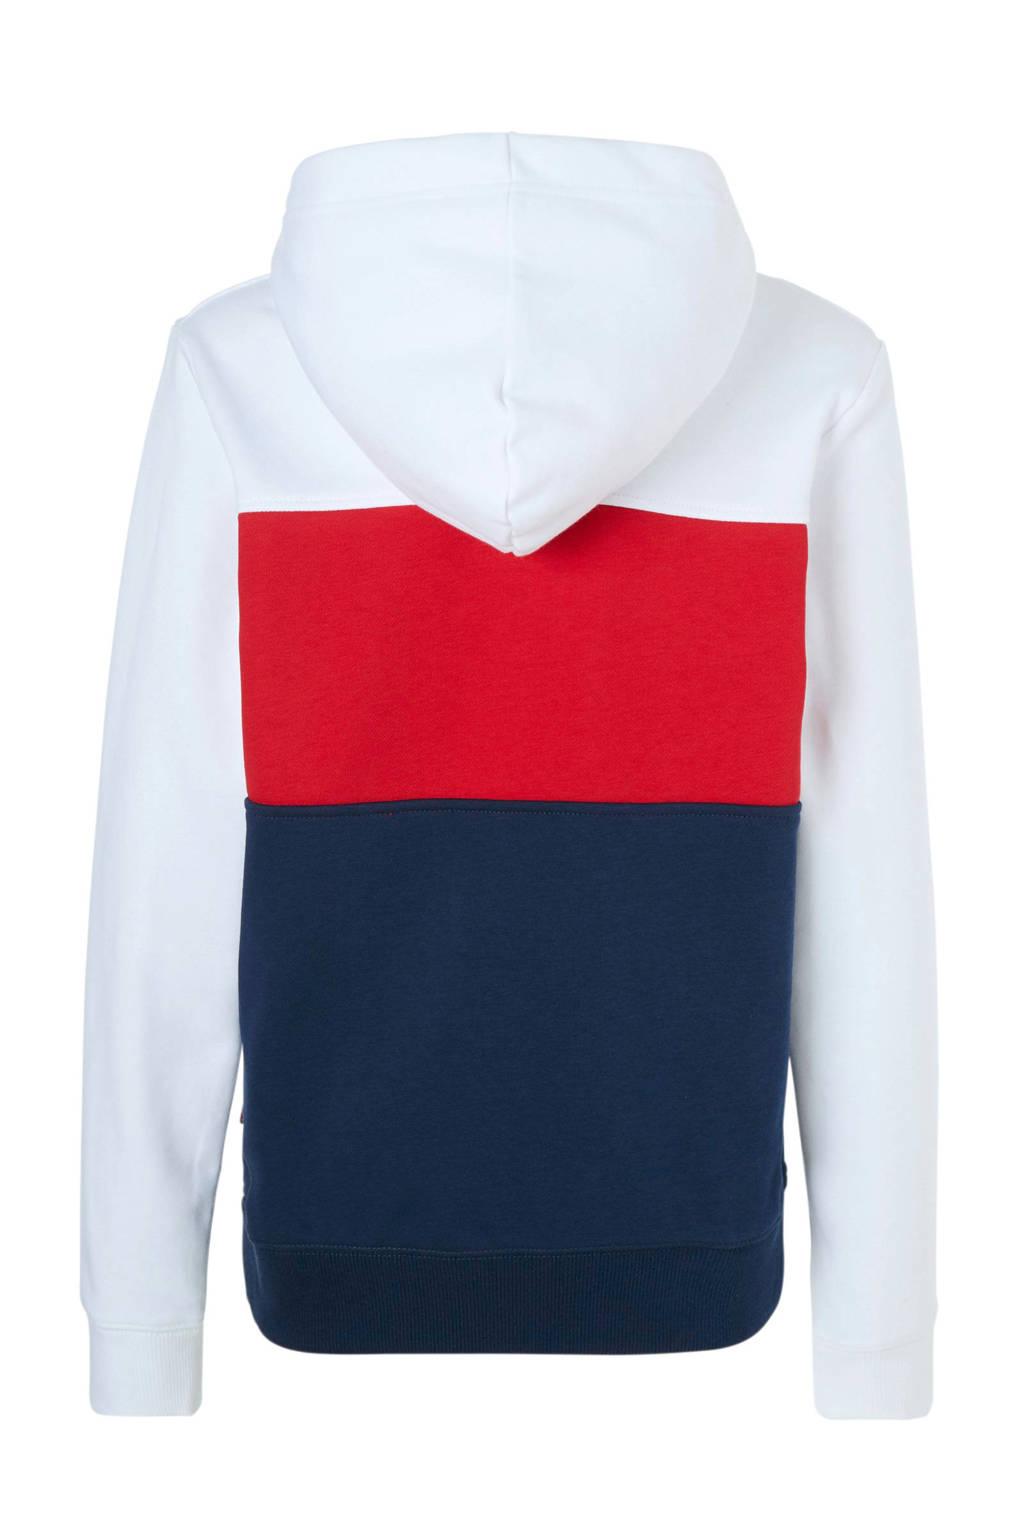 Levi's Kids hoodie met logo wit/blauw/rood, Wit/donkerblauw/rood